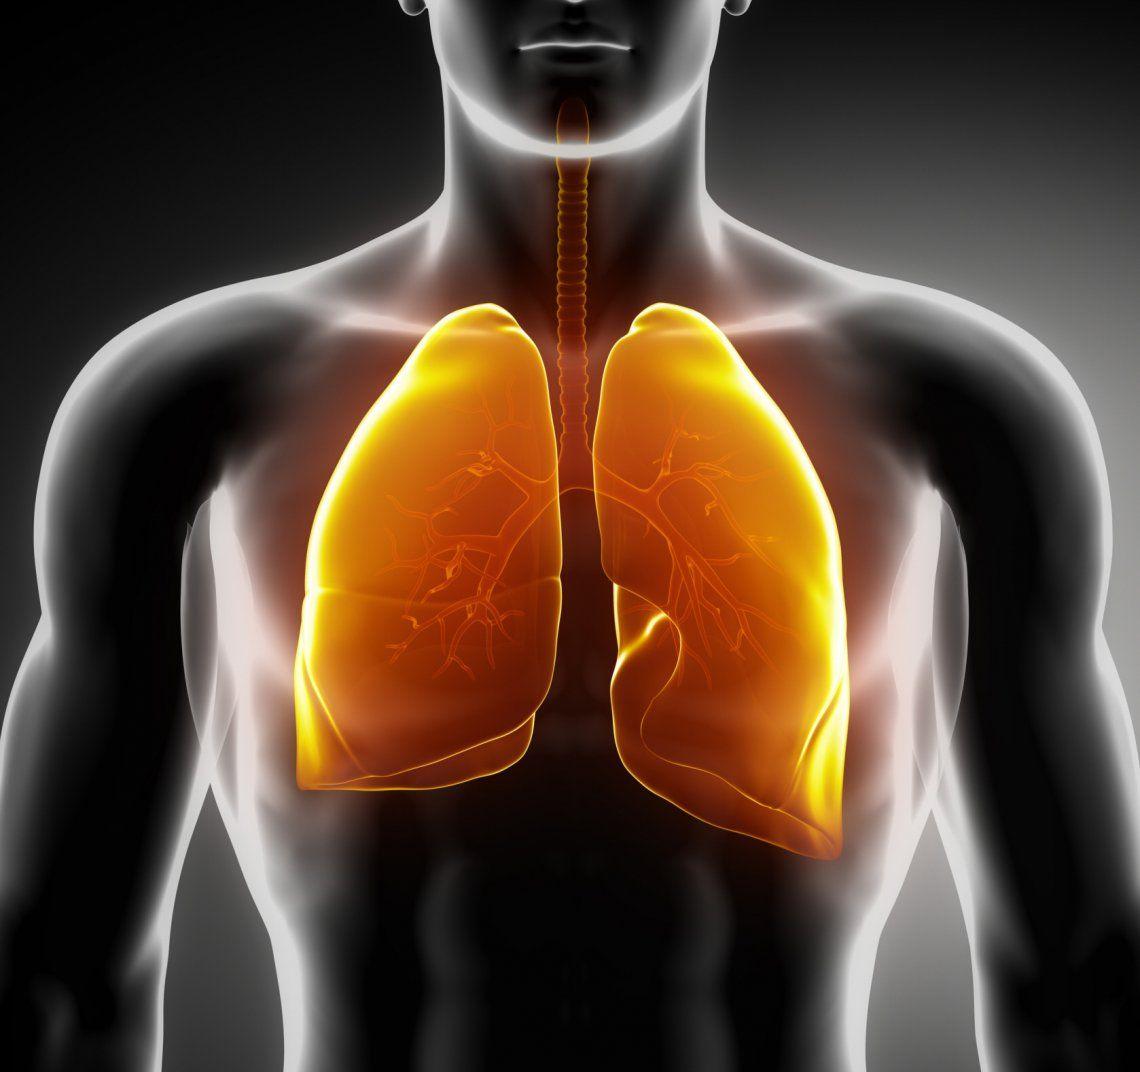 Muere un argentino por hora a causa del cáncer de pulmón